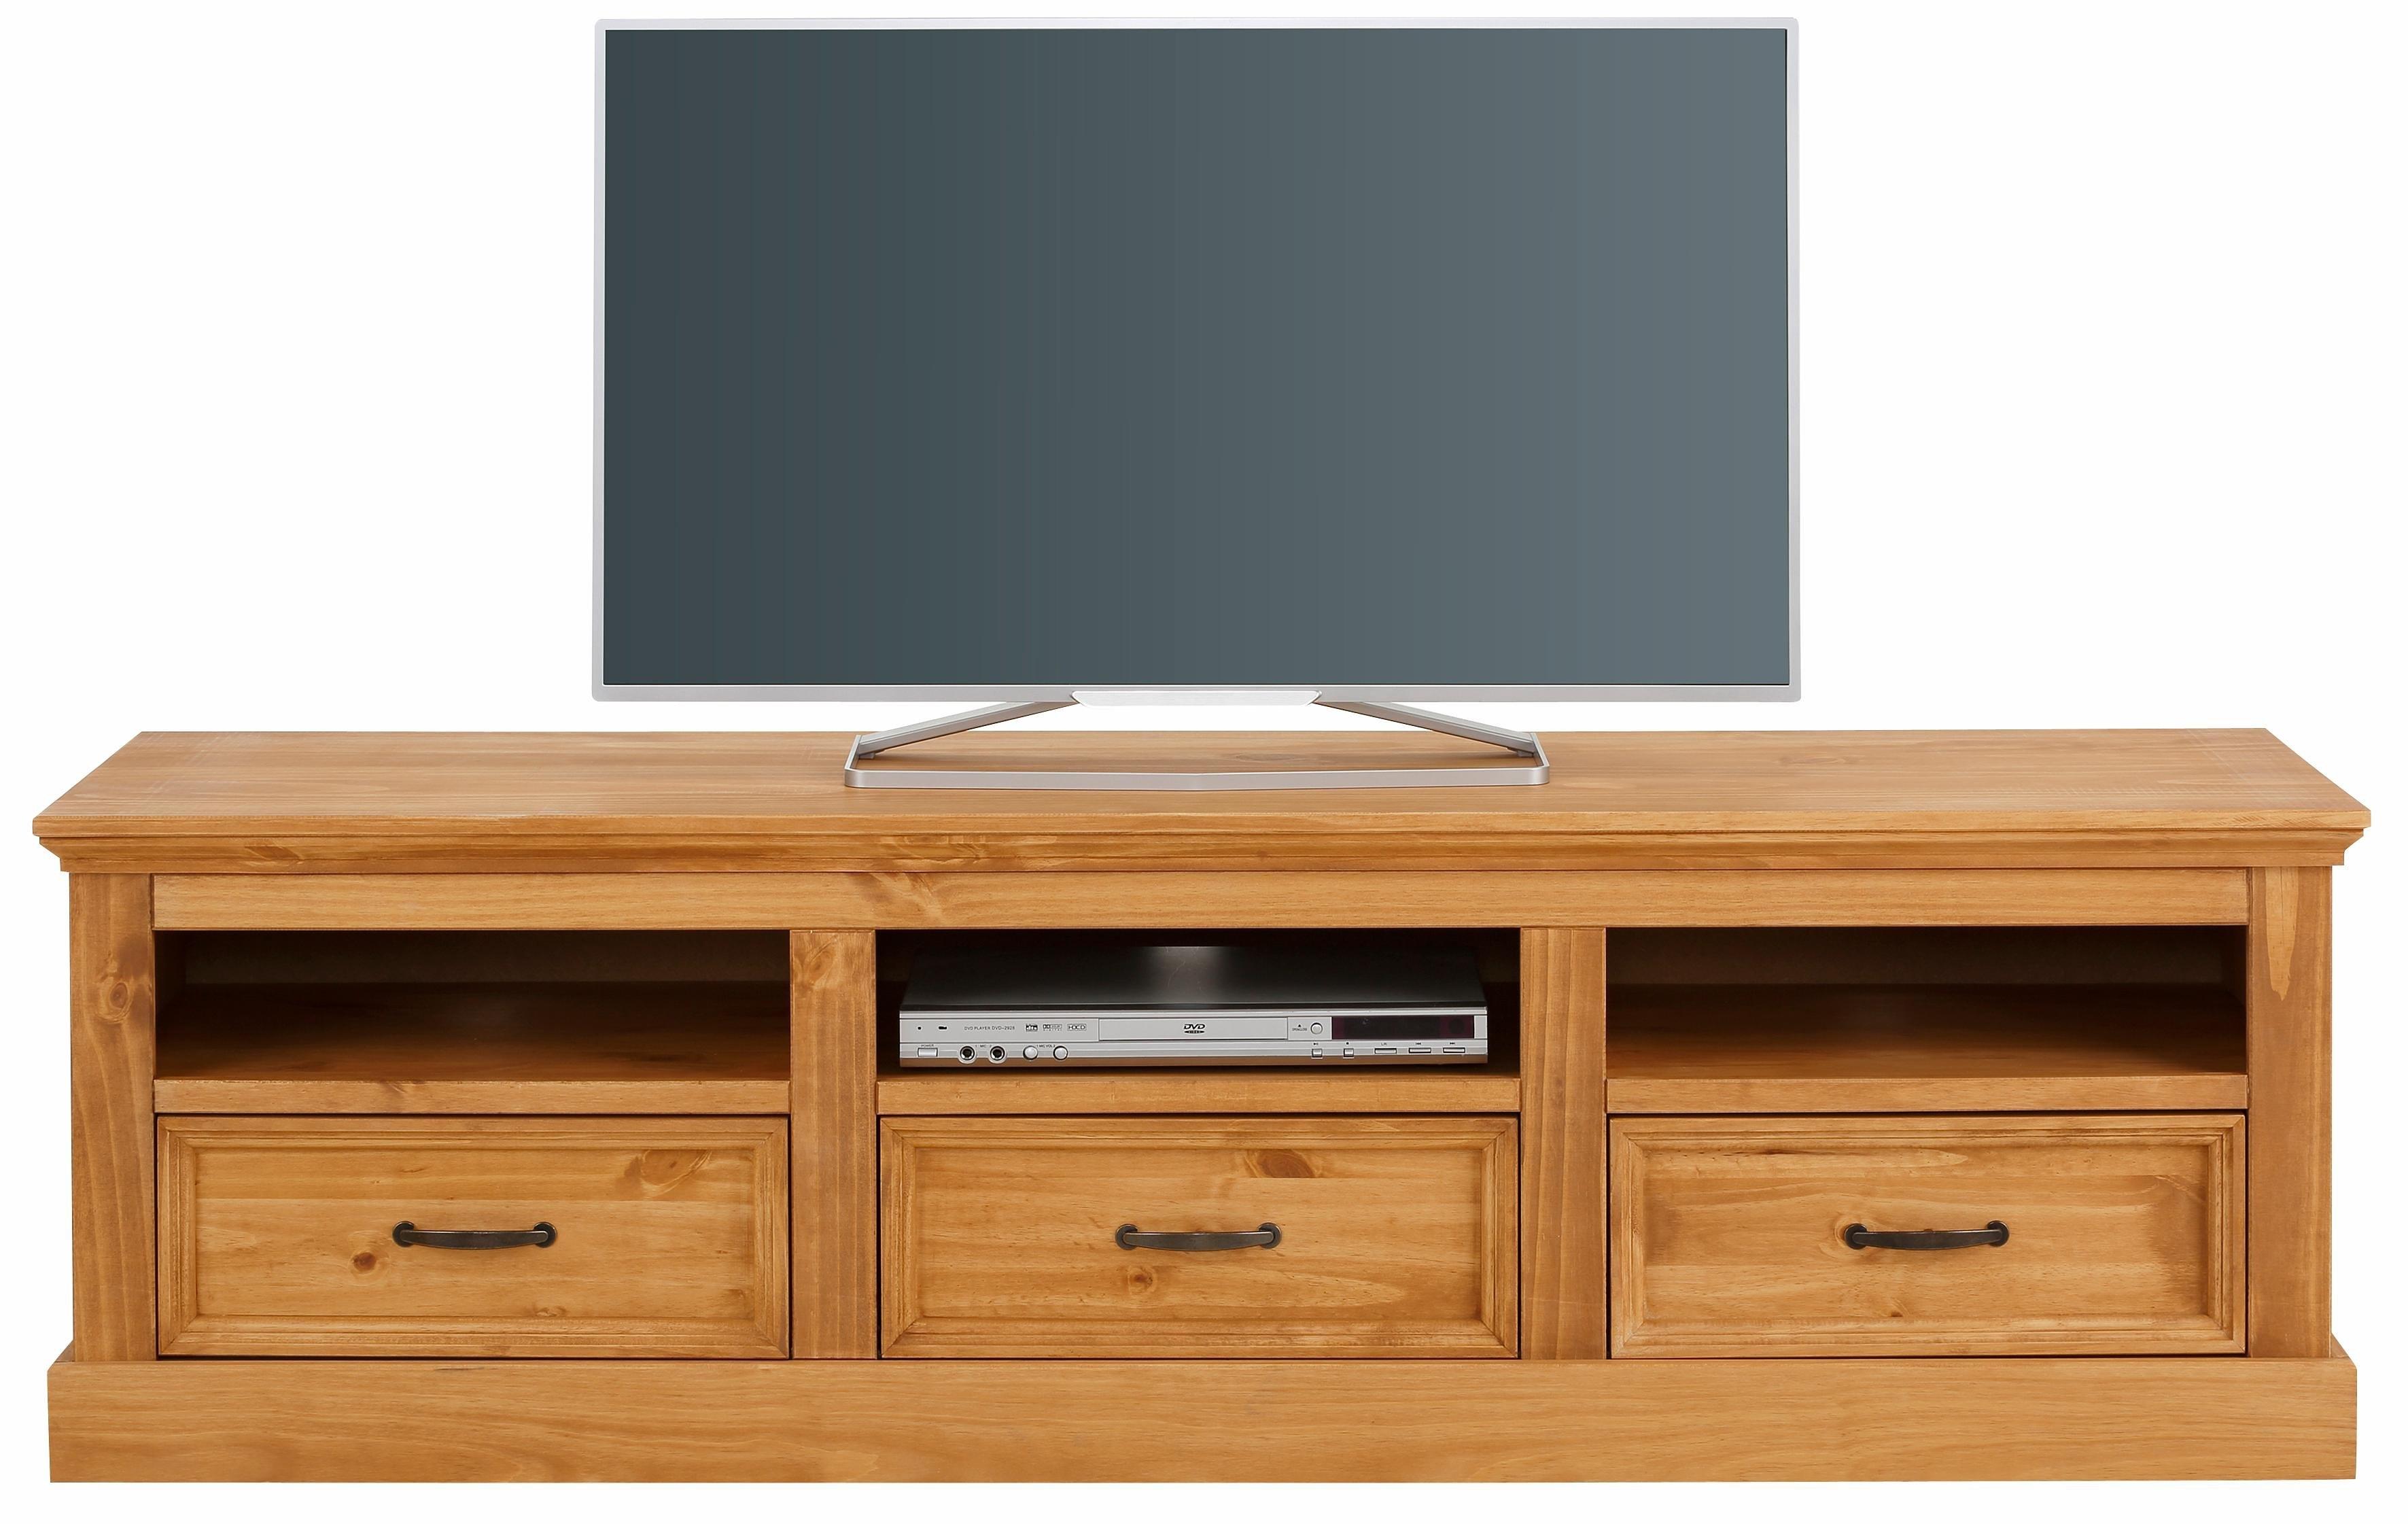 Home Affaire lowboard »Selma«, breedte 170 cm nu online kopen bij OTTO